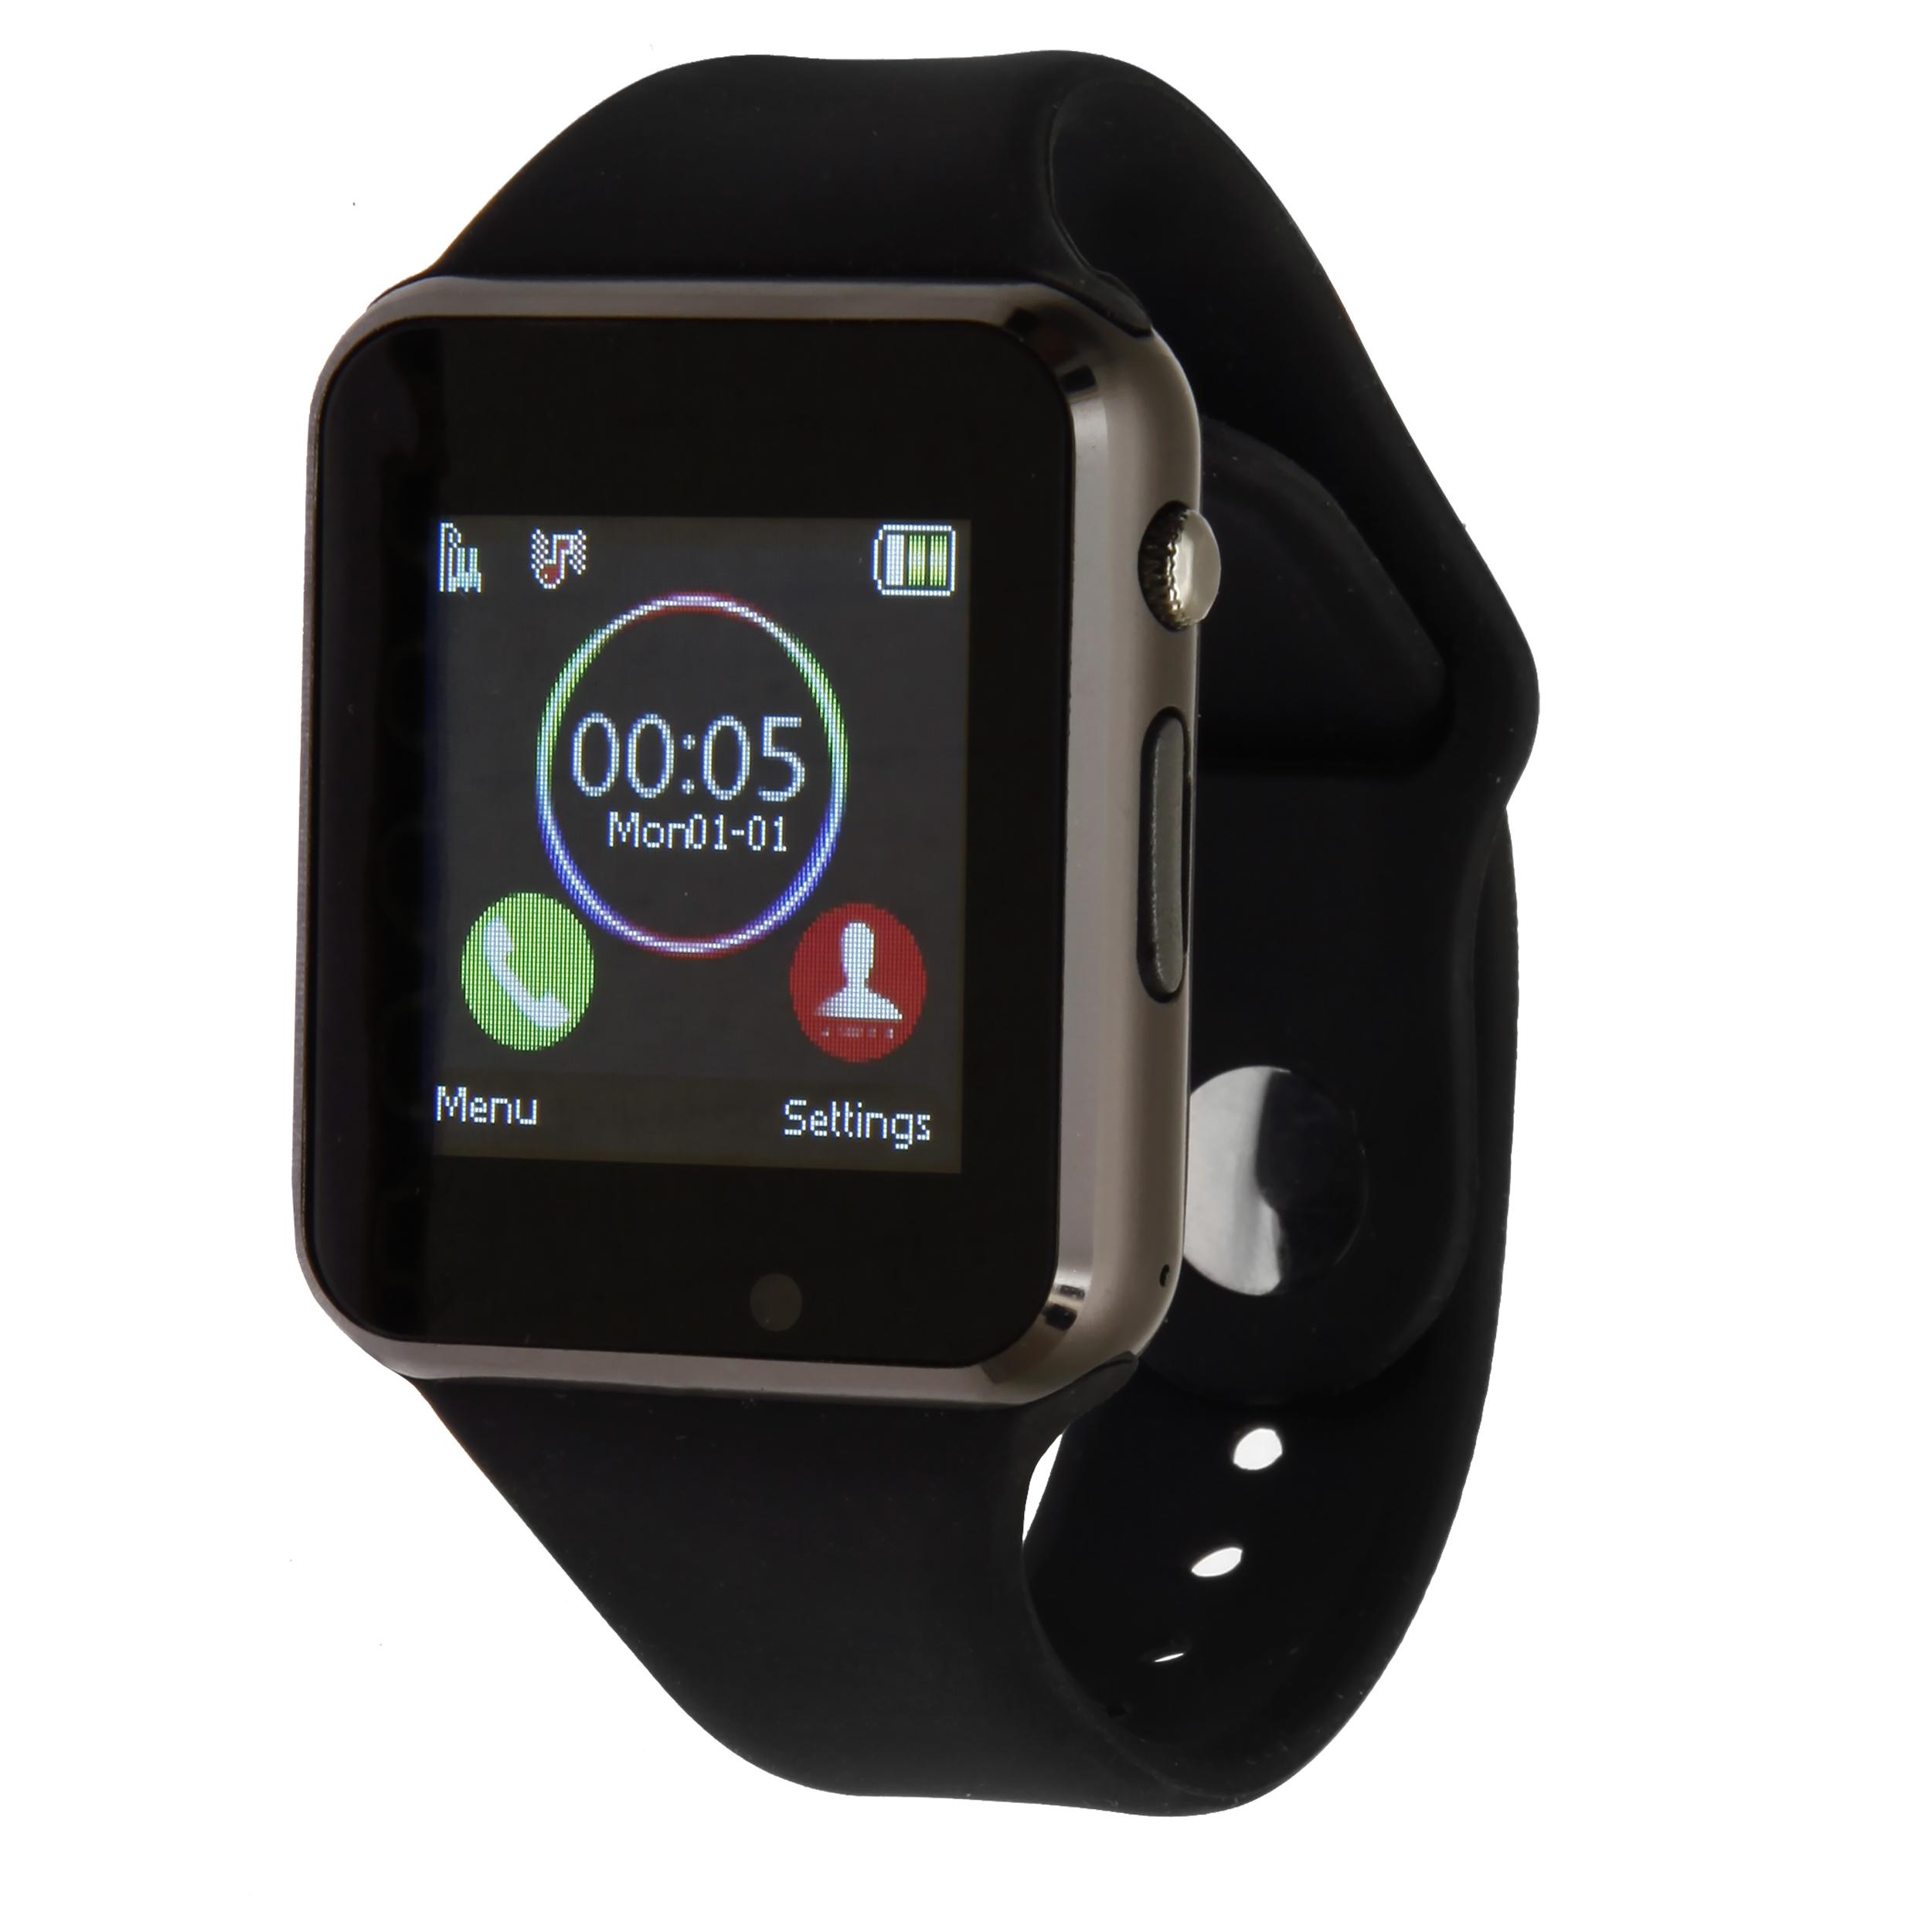 ساعت هوشمند سومگ مدل W101